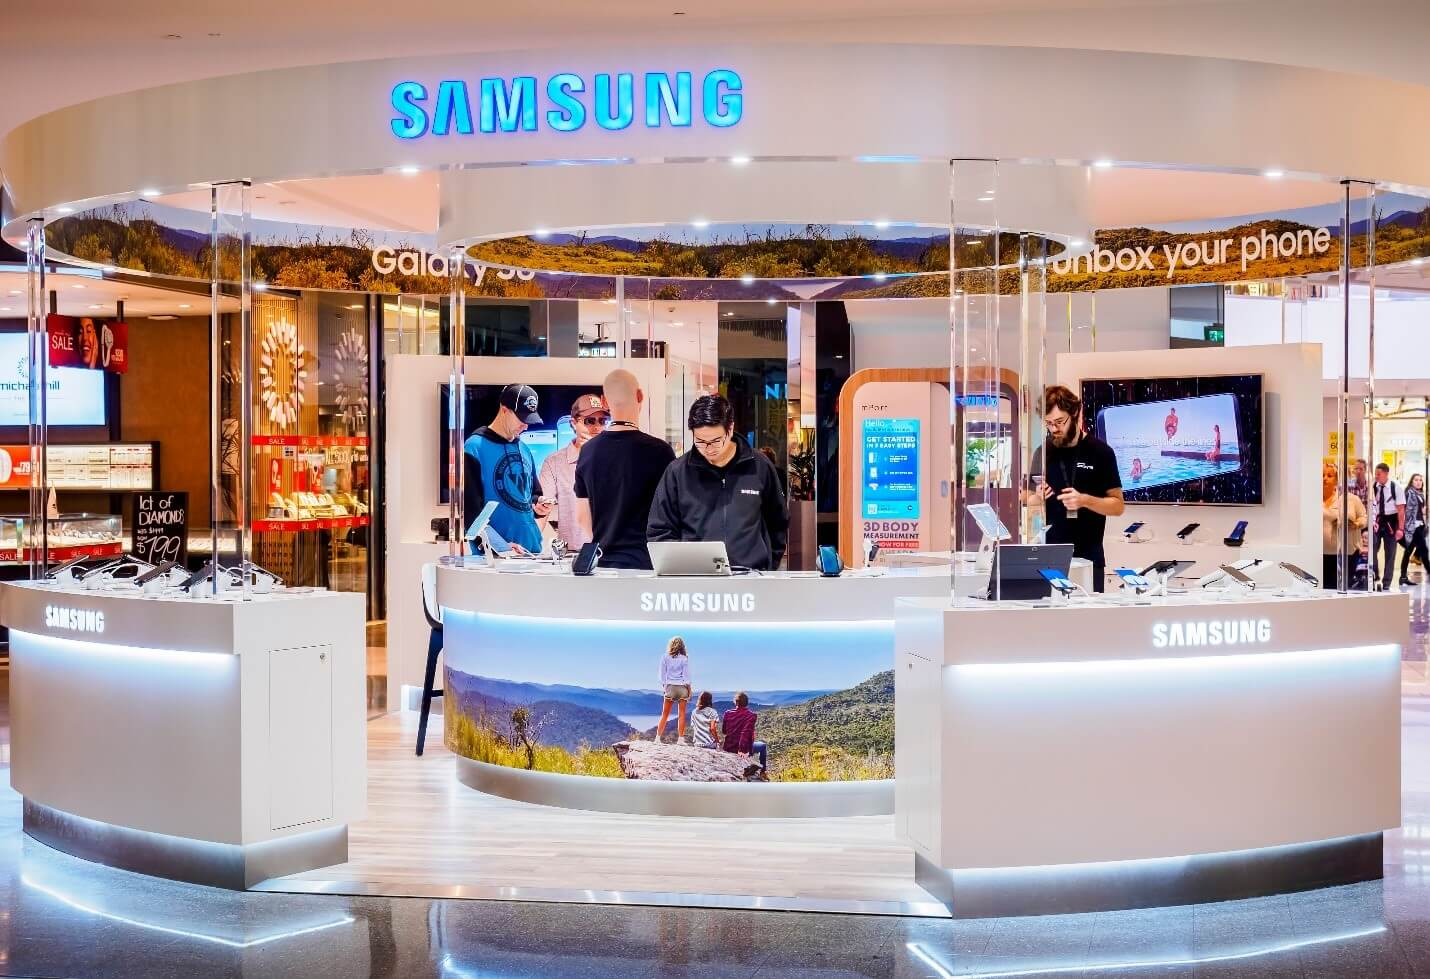 Samsung stall